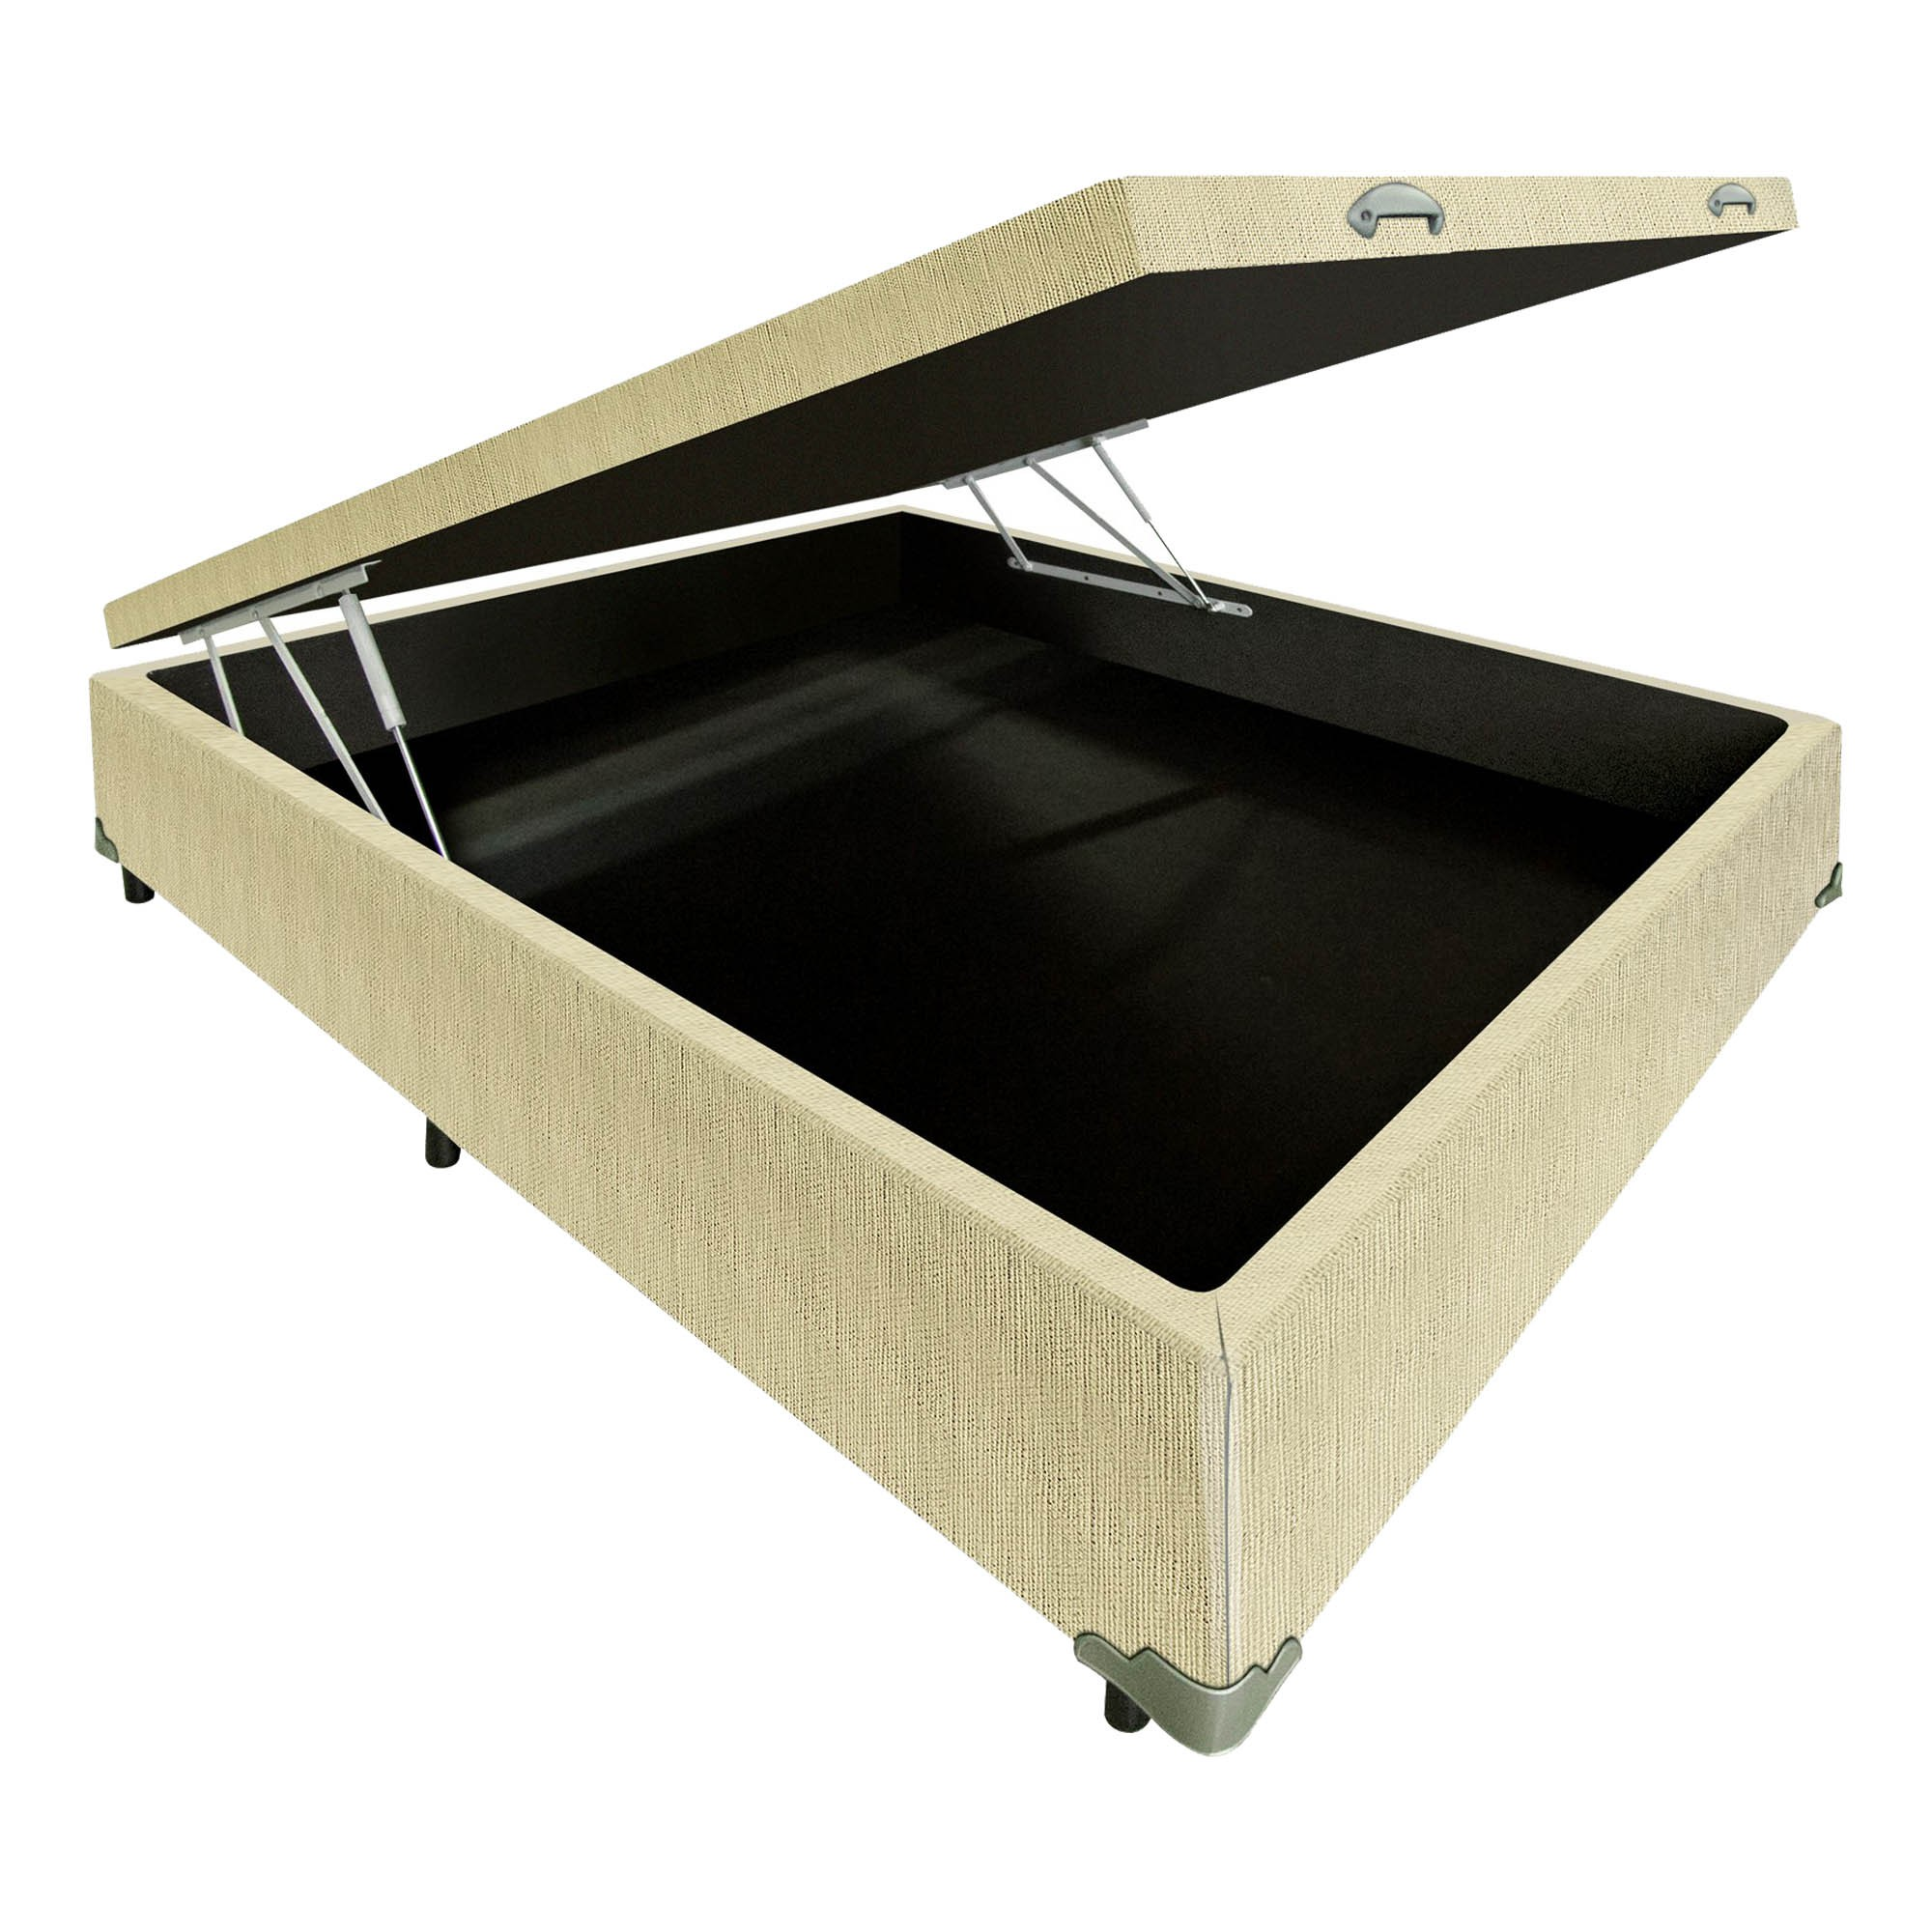 Box Baú Linhão Palha [Casal 138 x 188 cm]